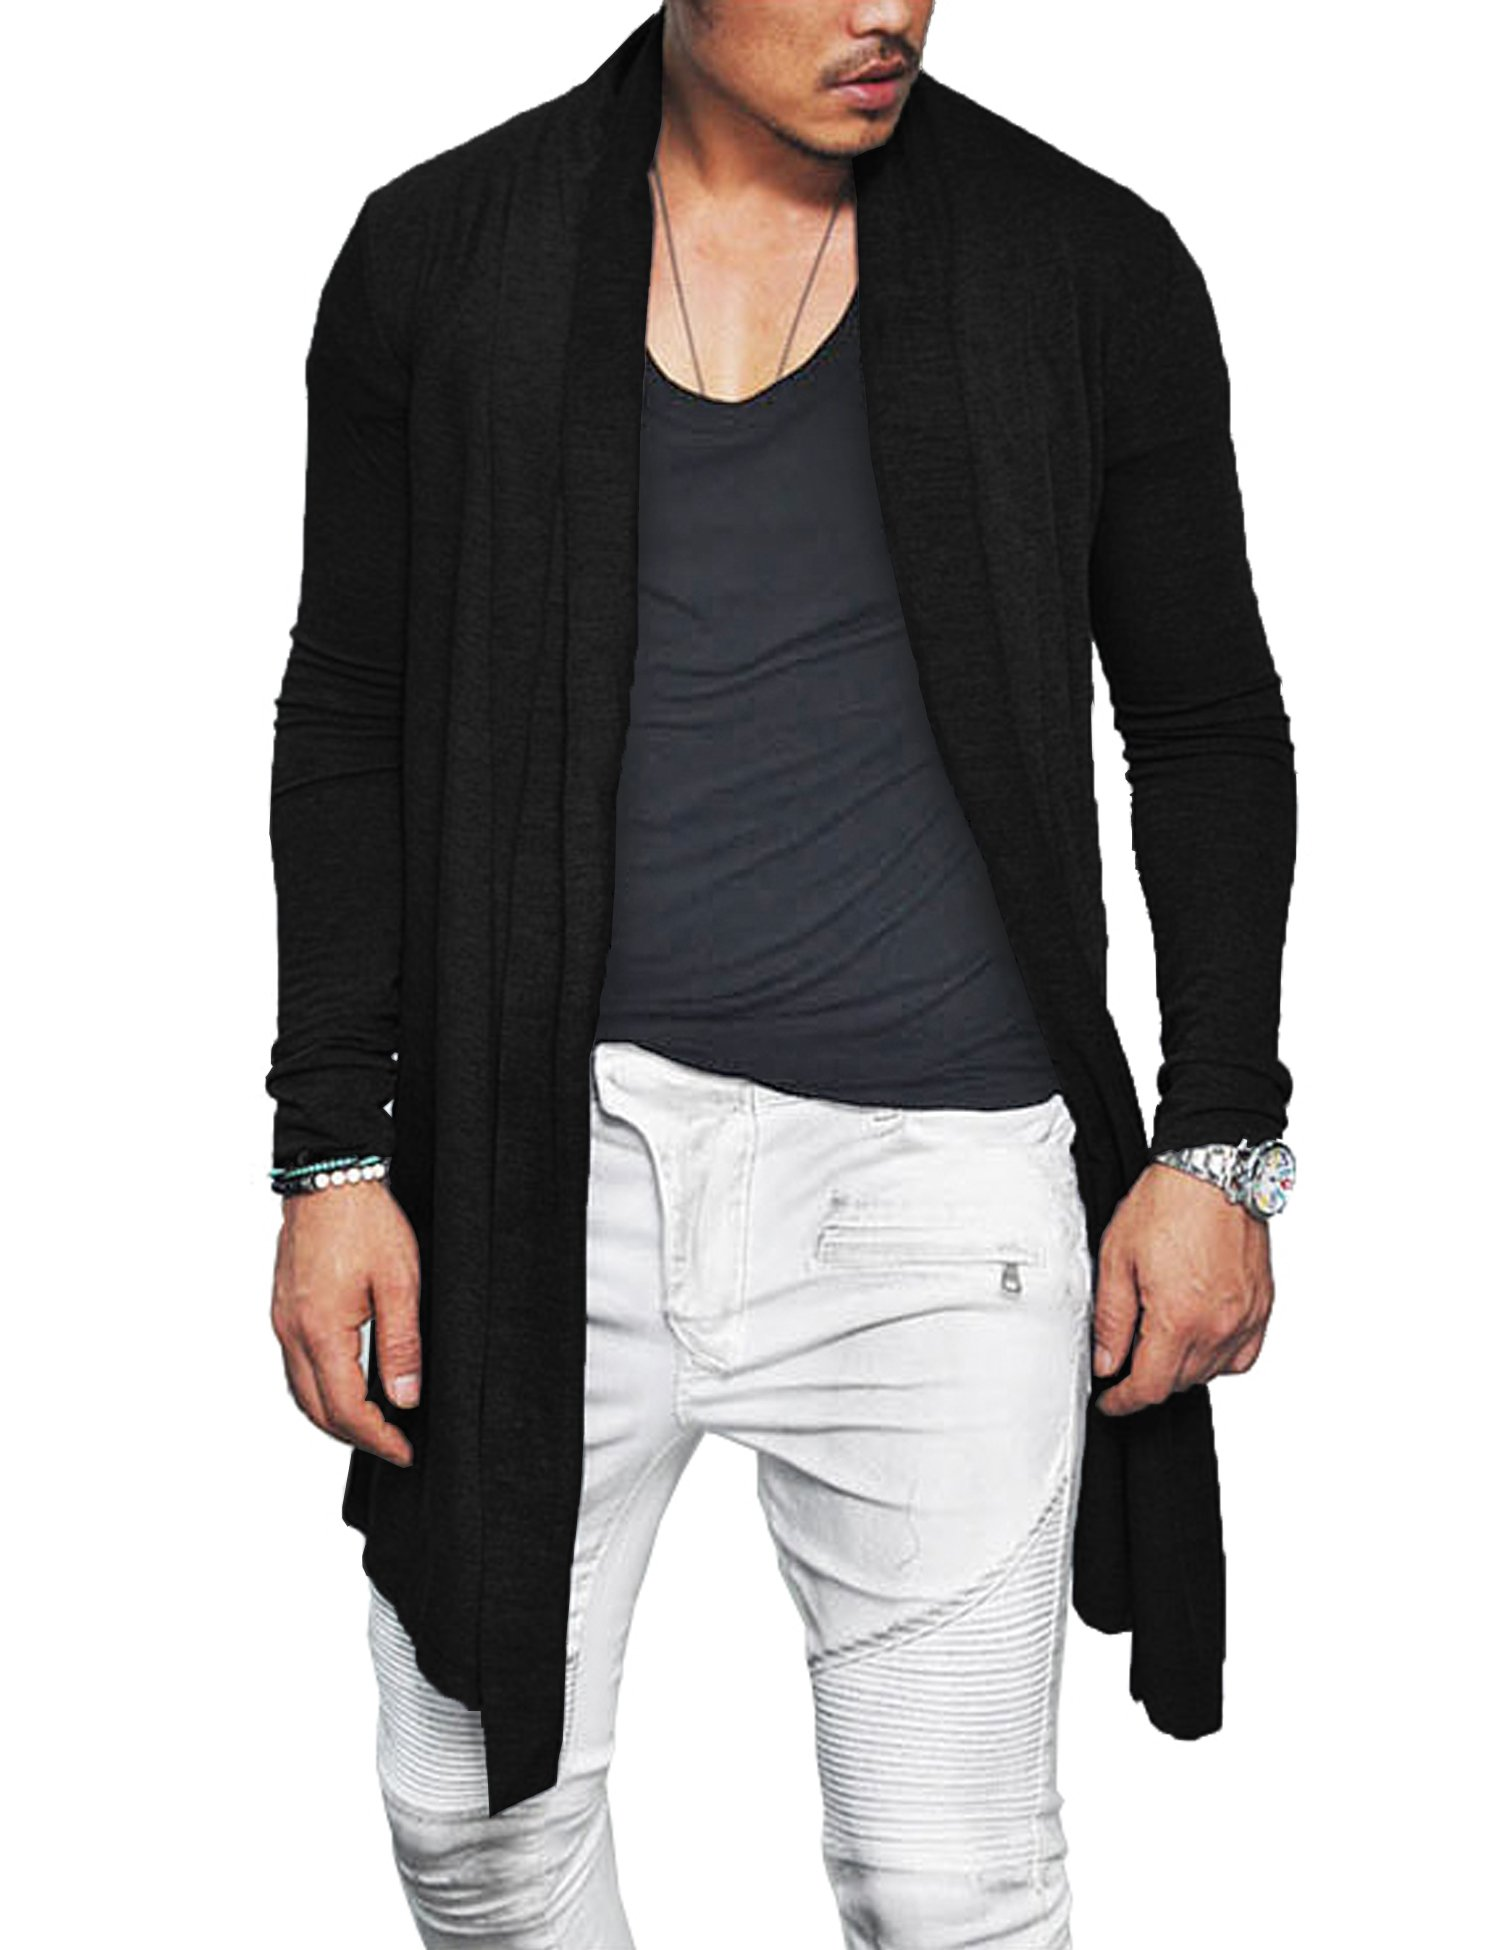 COOFANDY Men's Ruffle Shawl Collar Long Sleeves Cardigan (Medium, Black)